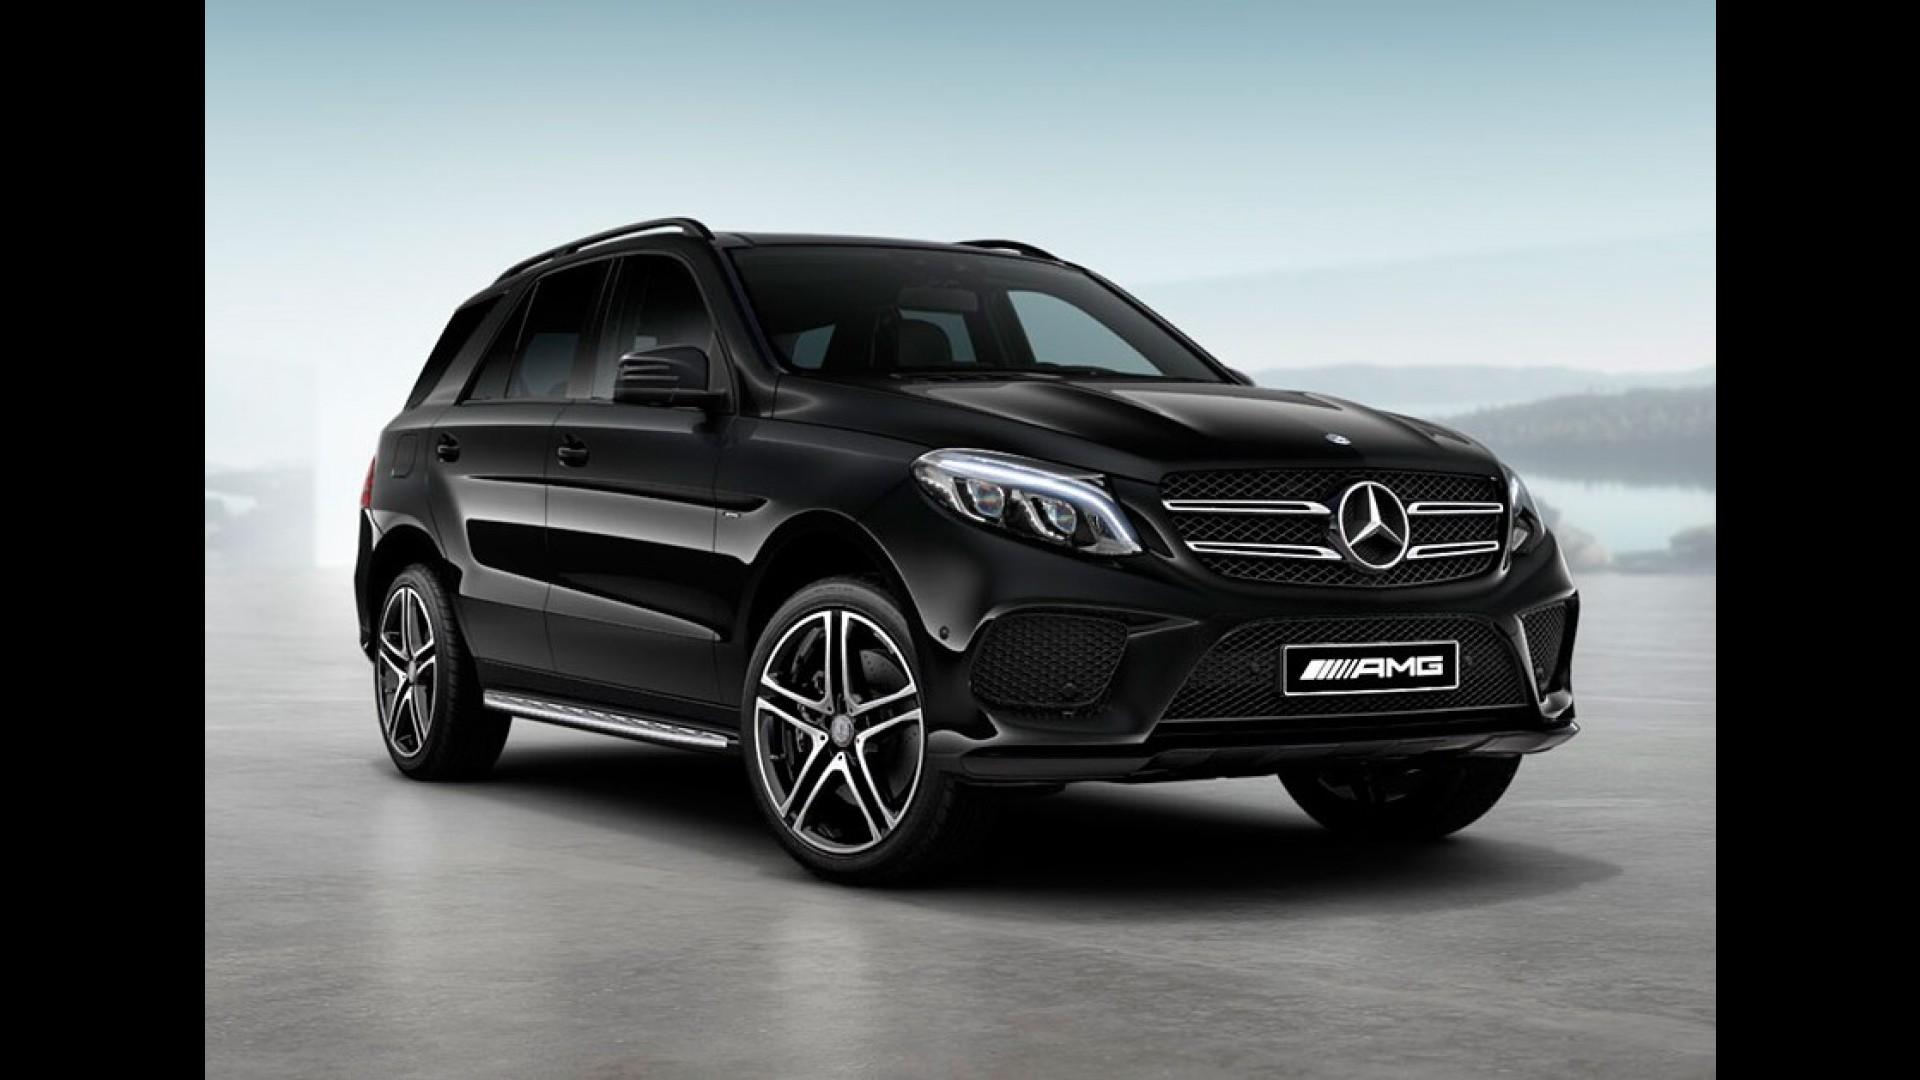 Mercedes Gle Ganha Serie 450 Amg Black Editon De 367 Cv Por R 475 9 Mil